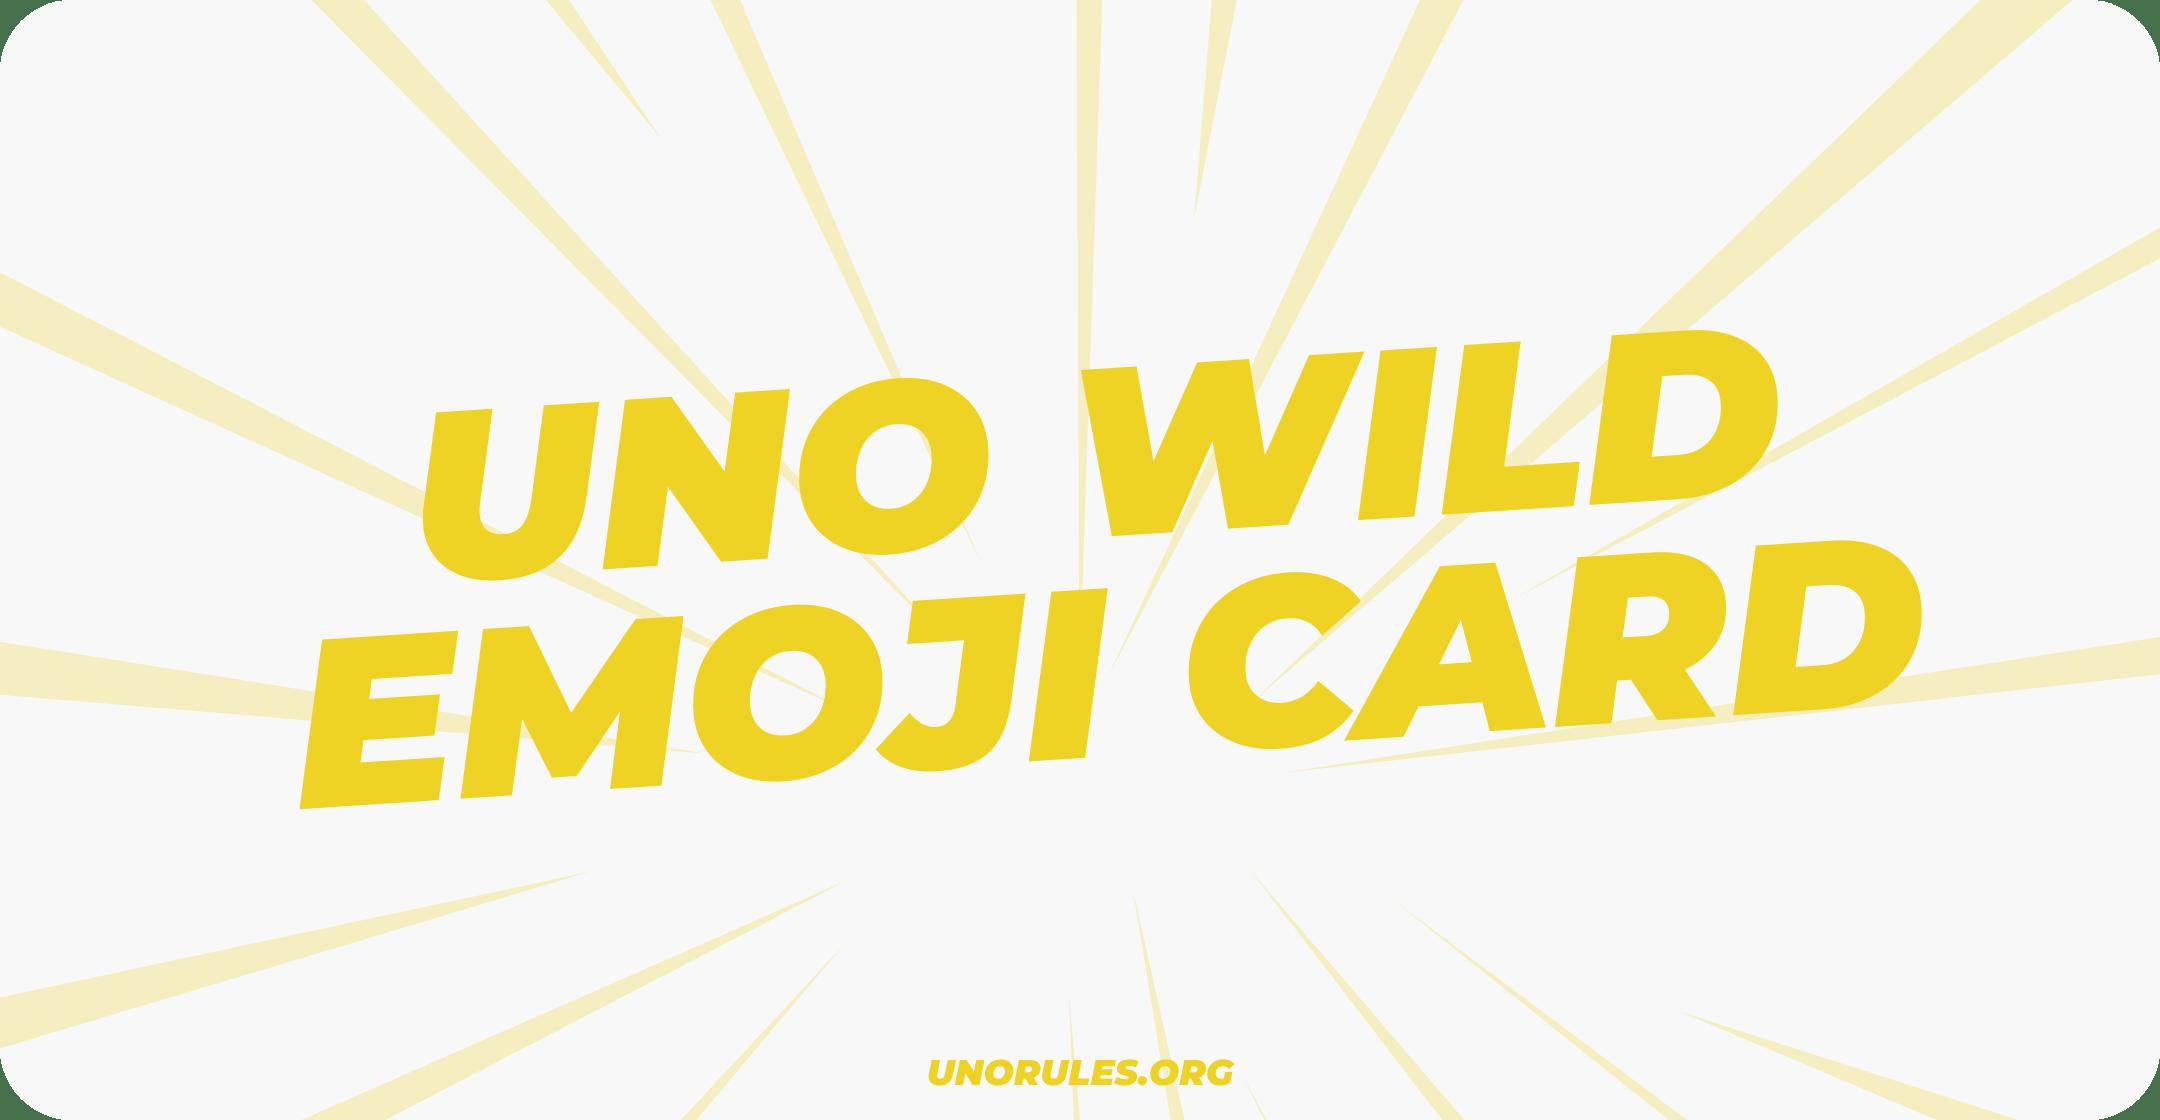 Uno Wild Emoji Card